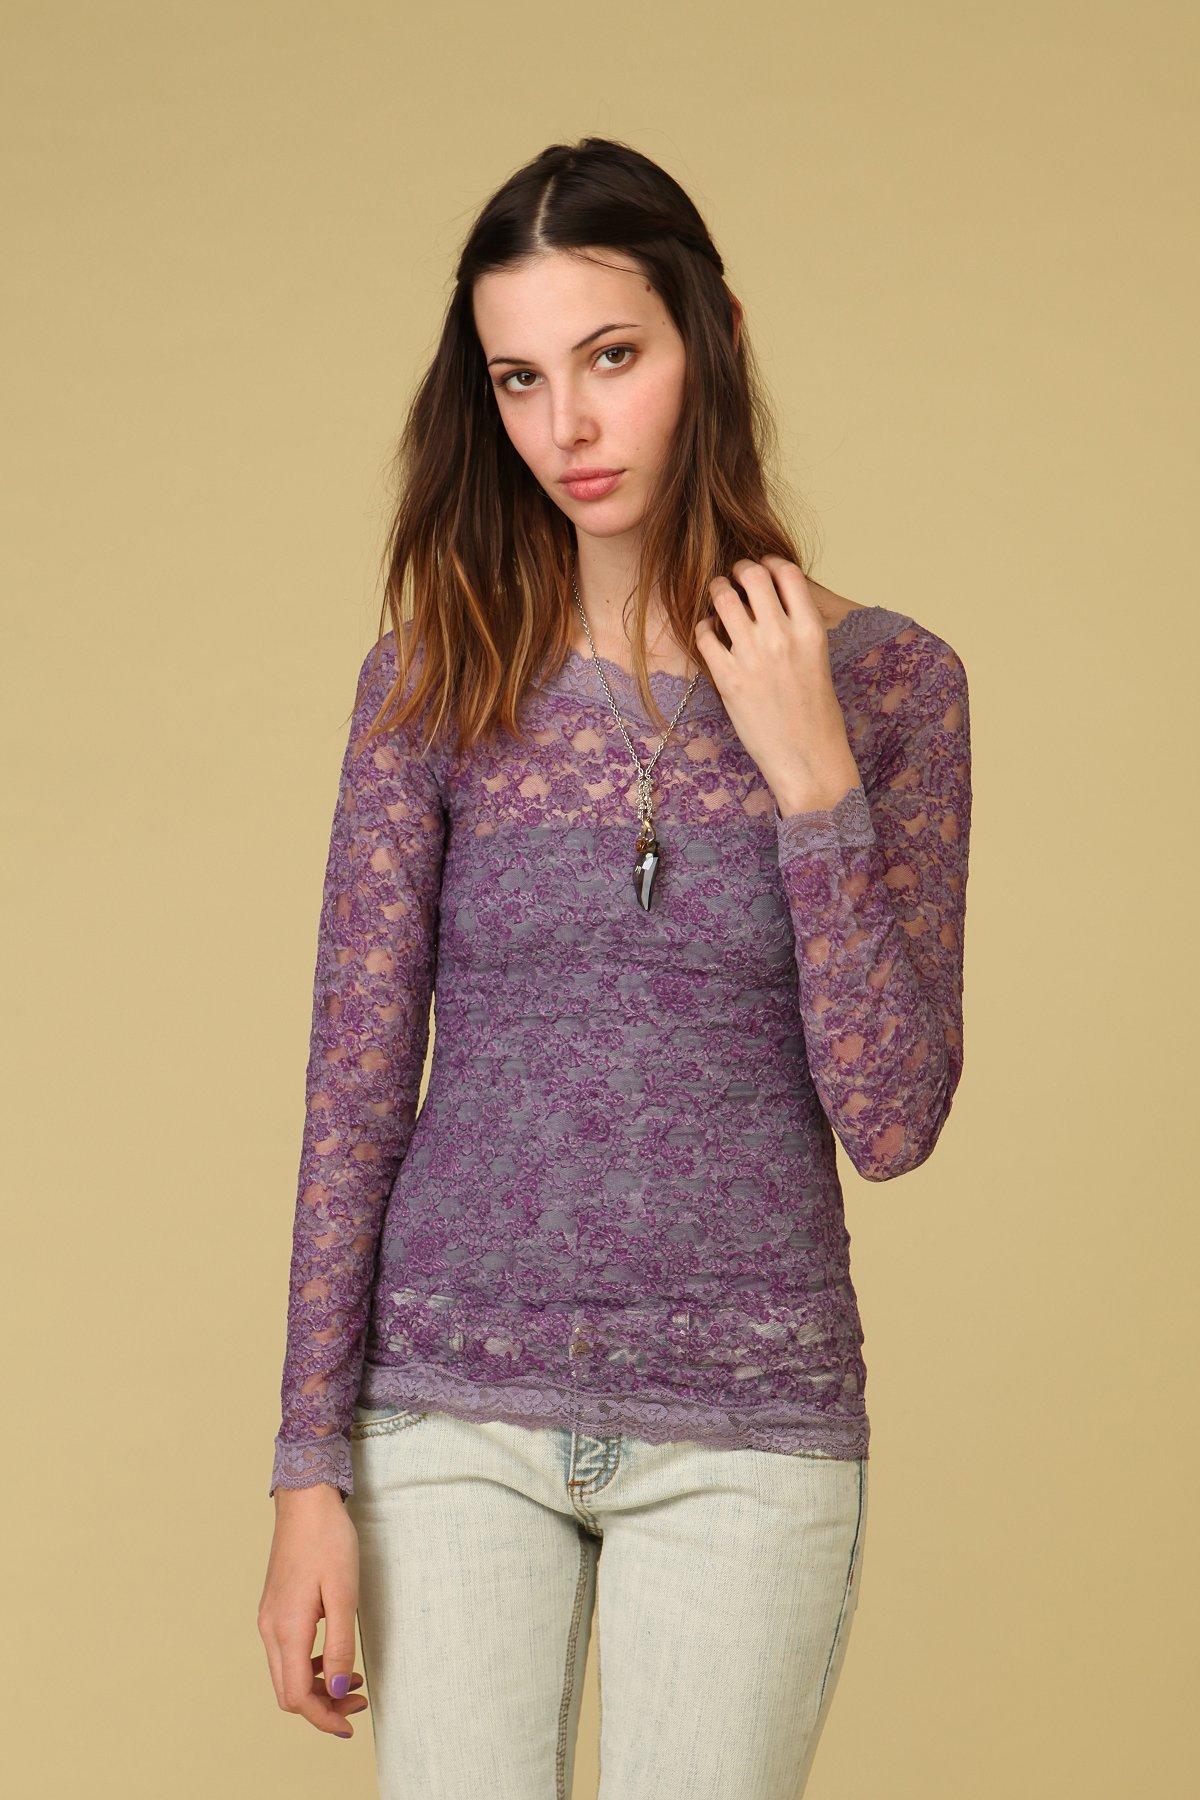 Printed Bronte Lace Top